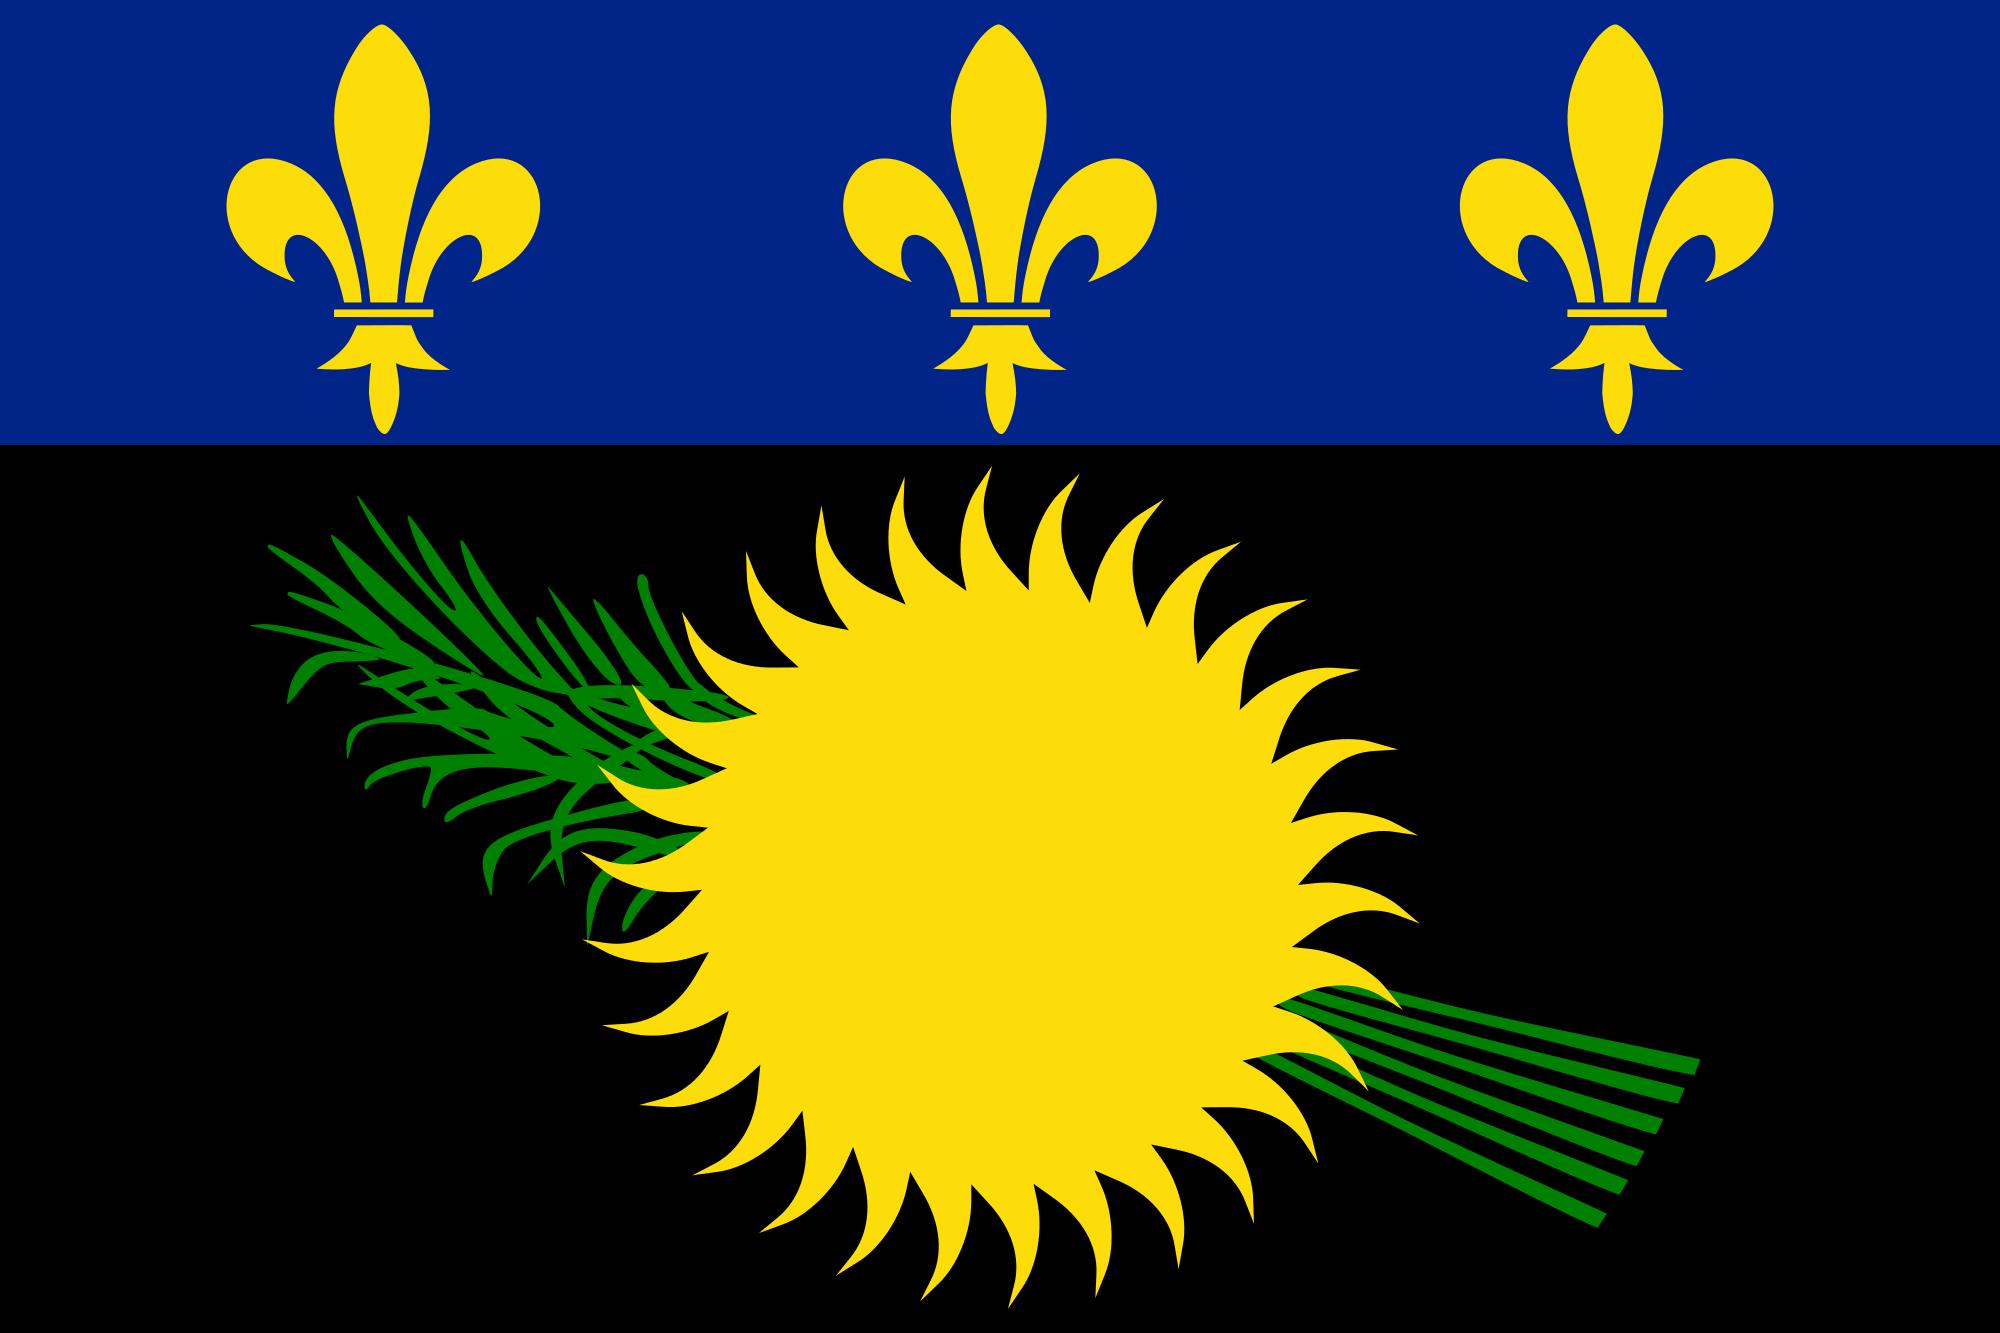 Guadalupe, pays, emblème, logo, symbole - Fonds d'écran HD - Professor-falken.com